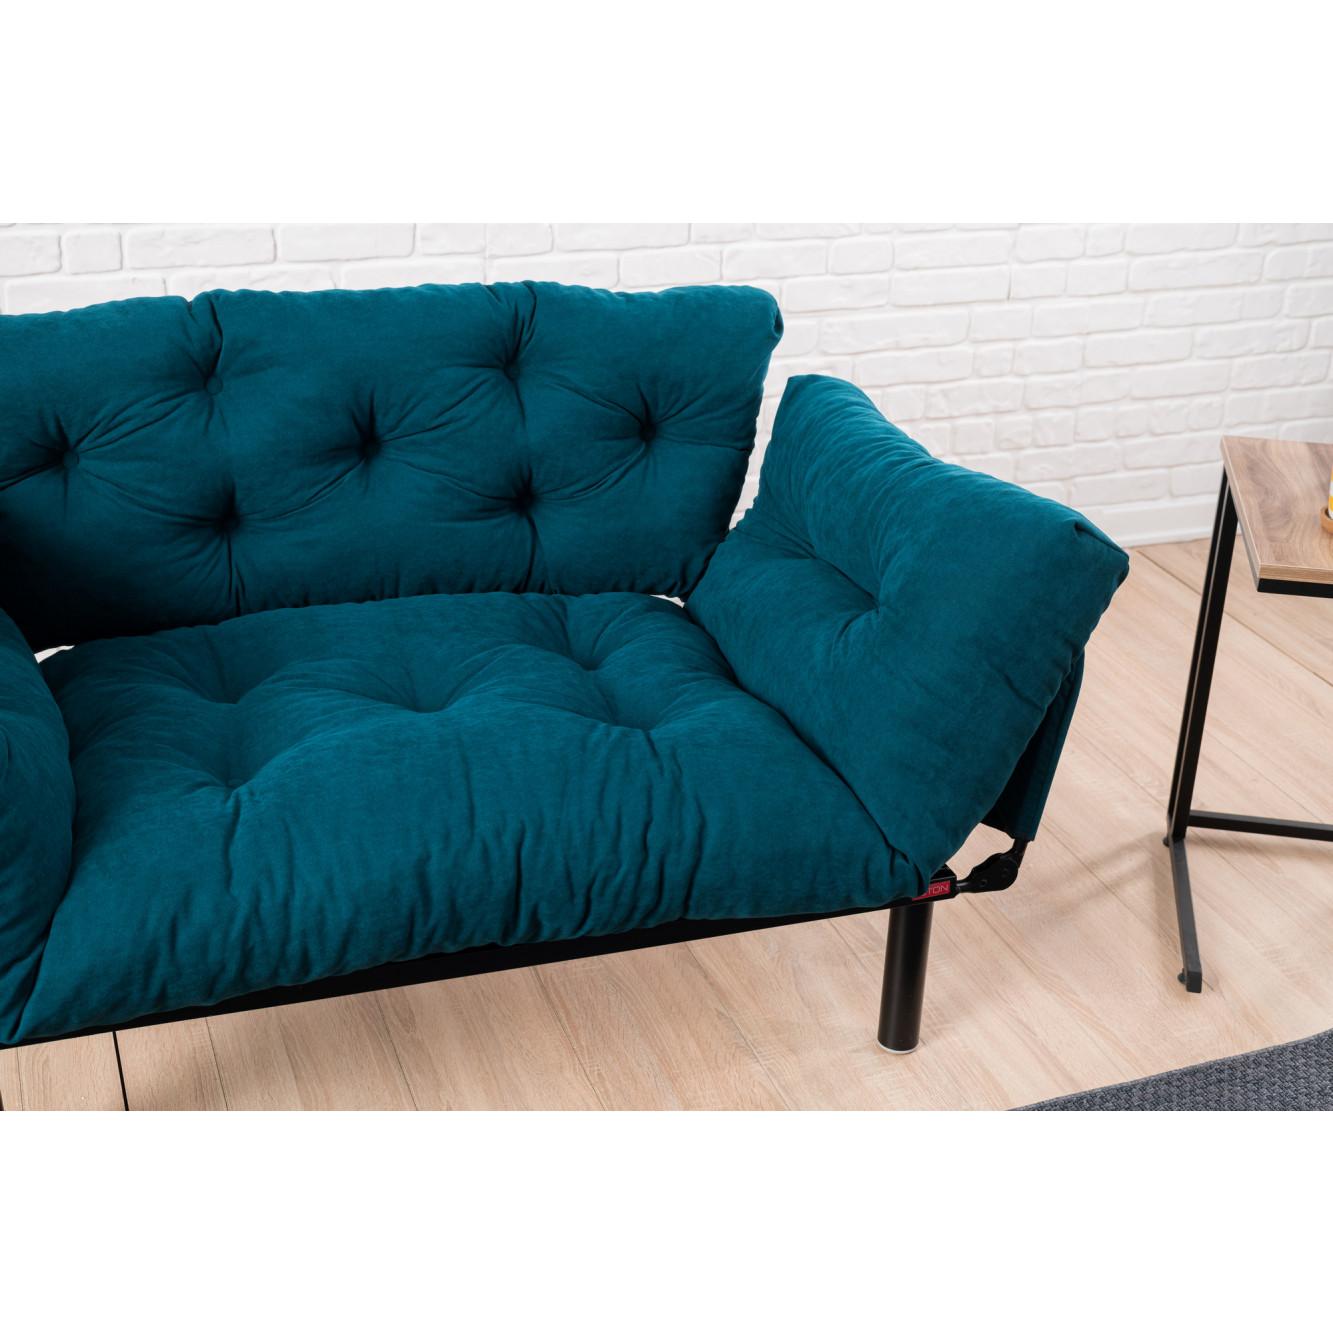 2-Sitz-Sofabett Nitta   Benzinblau